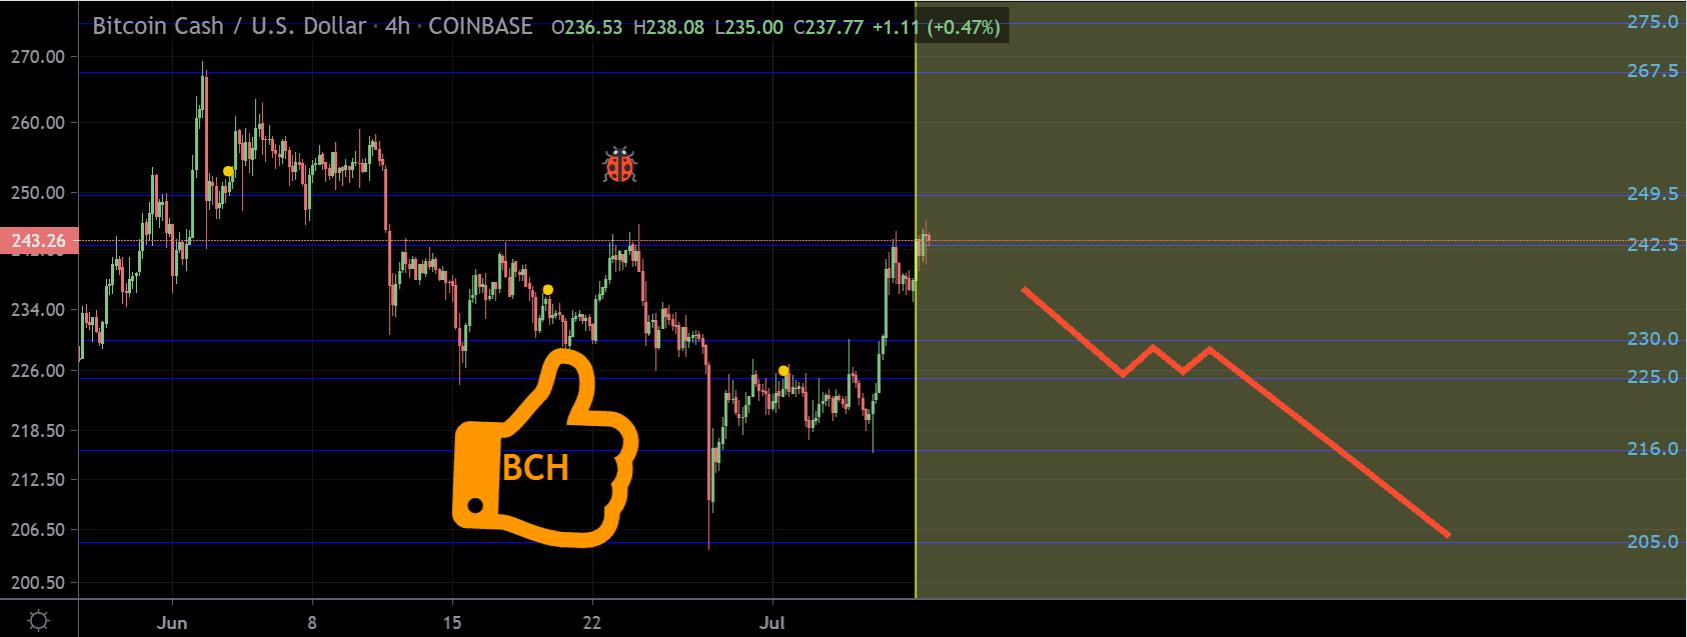 Bitcoin Cash price chart 2 - 8 July